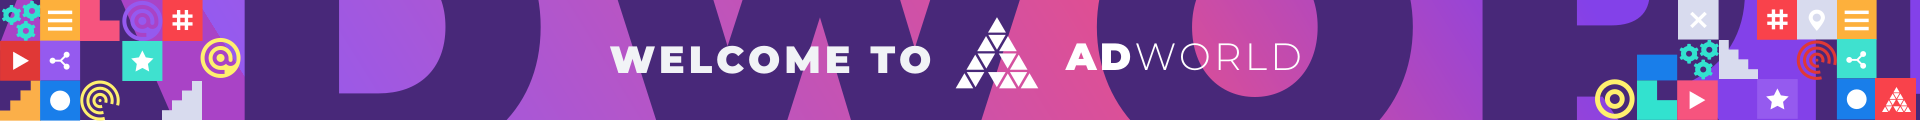 Adworld 2020 Banner